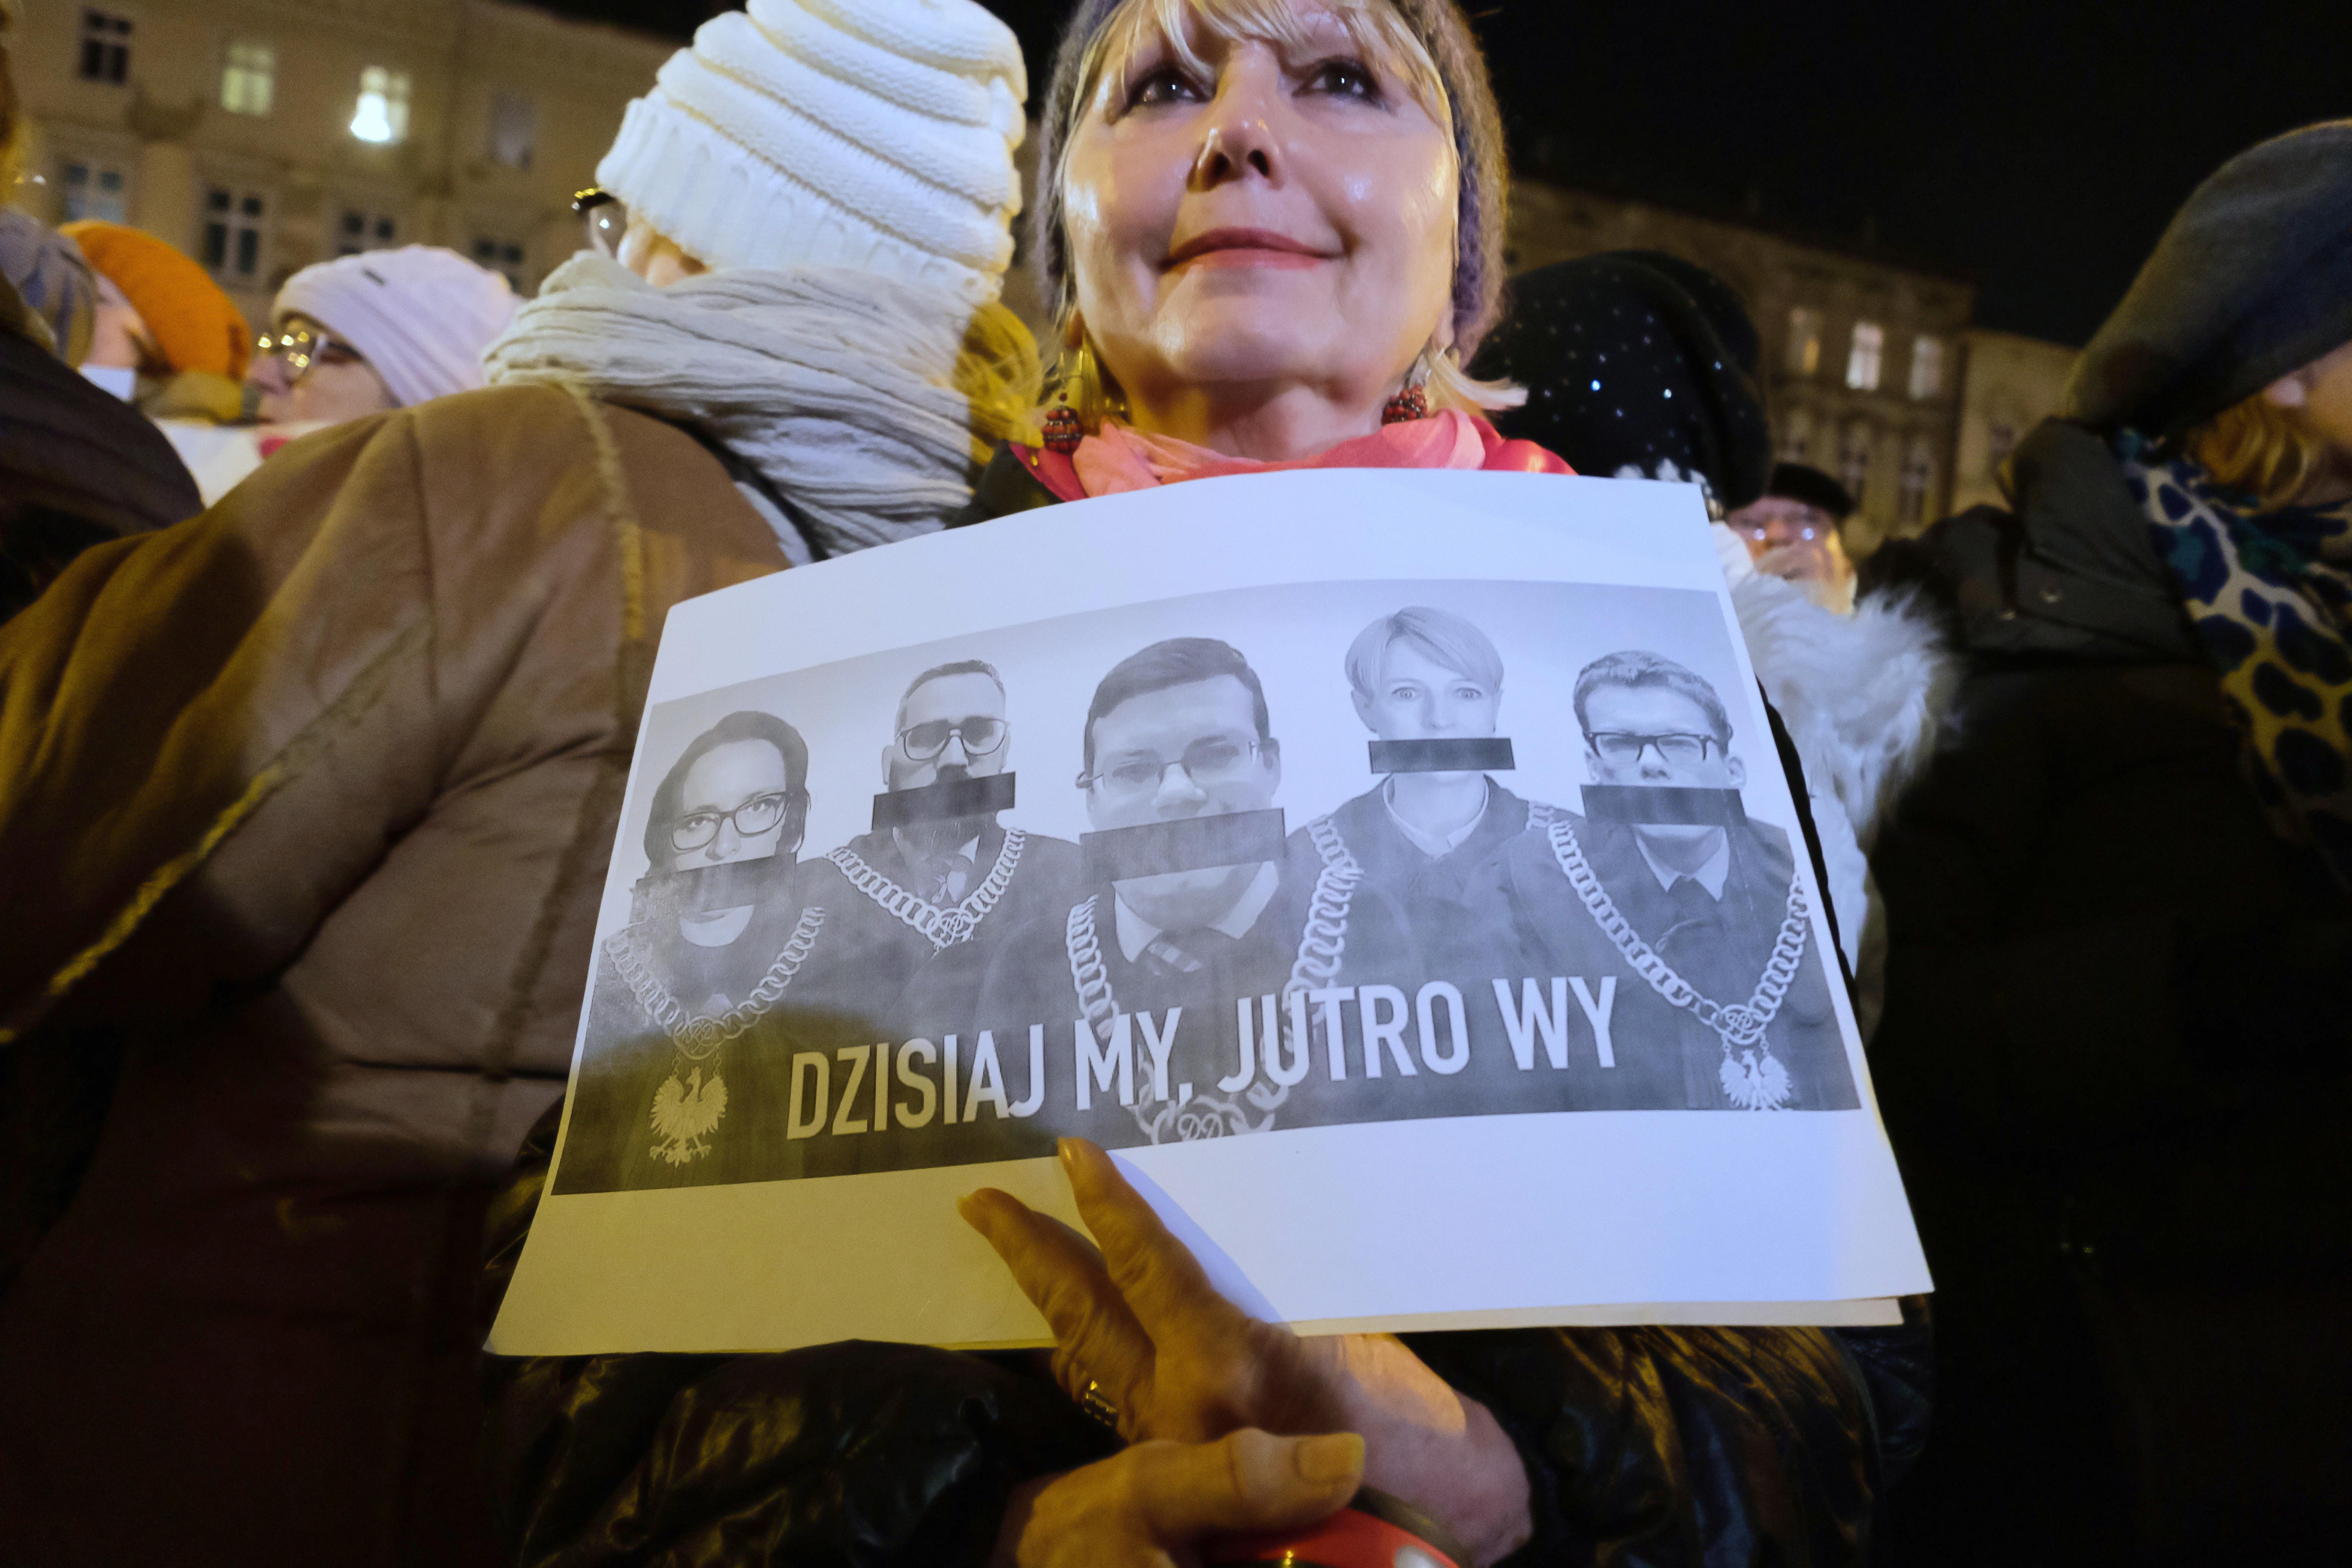 Poland judiciary muzzling Pozan courts